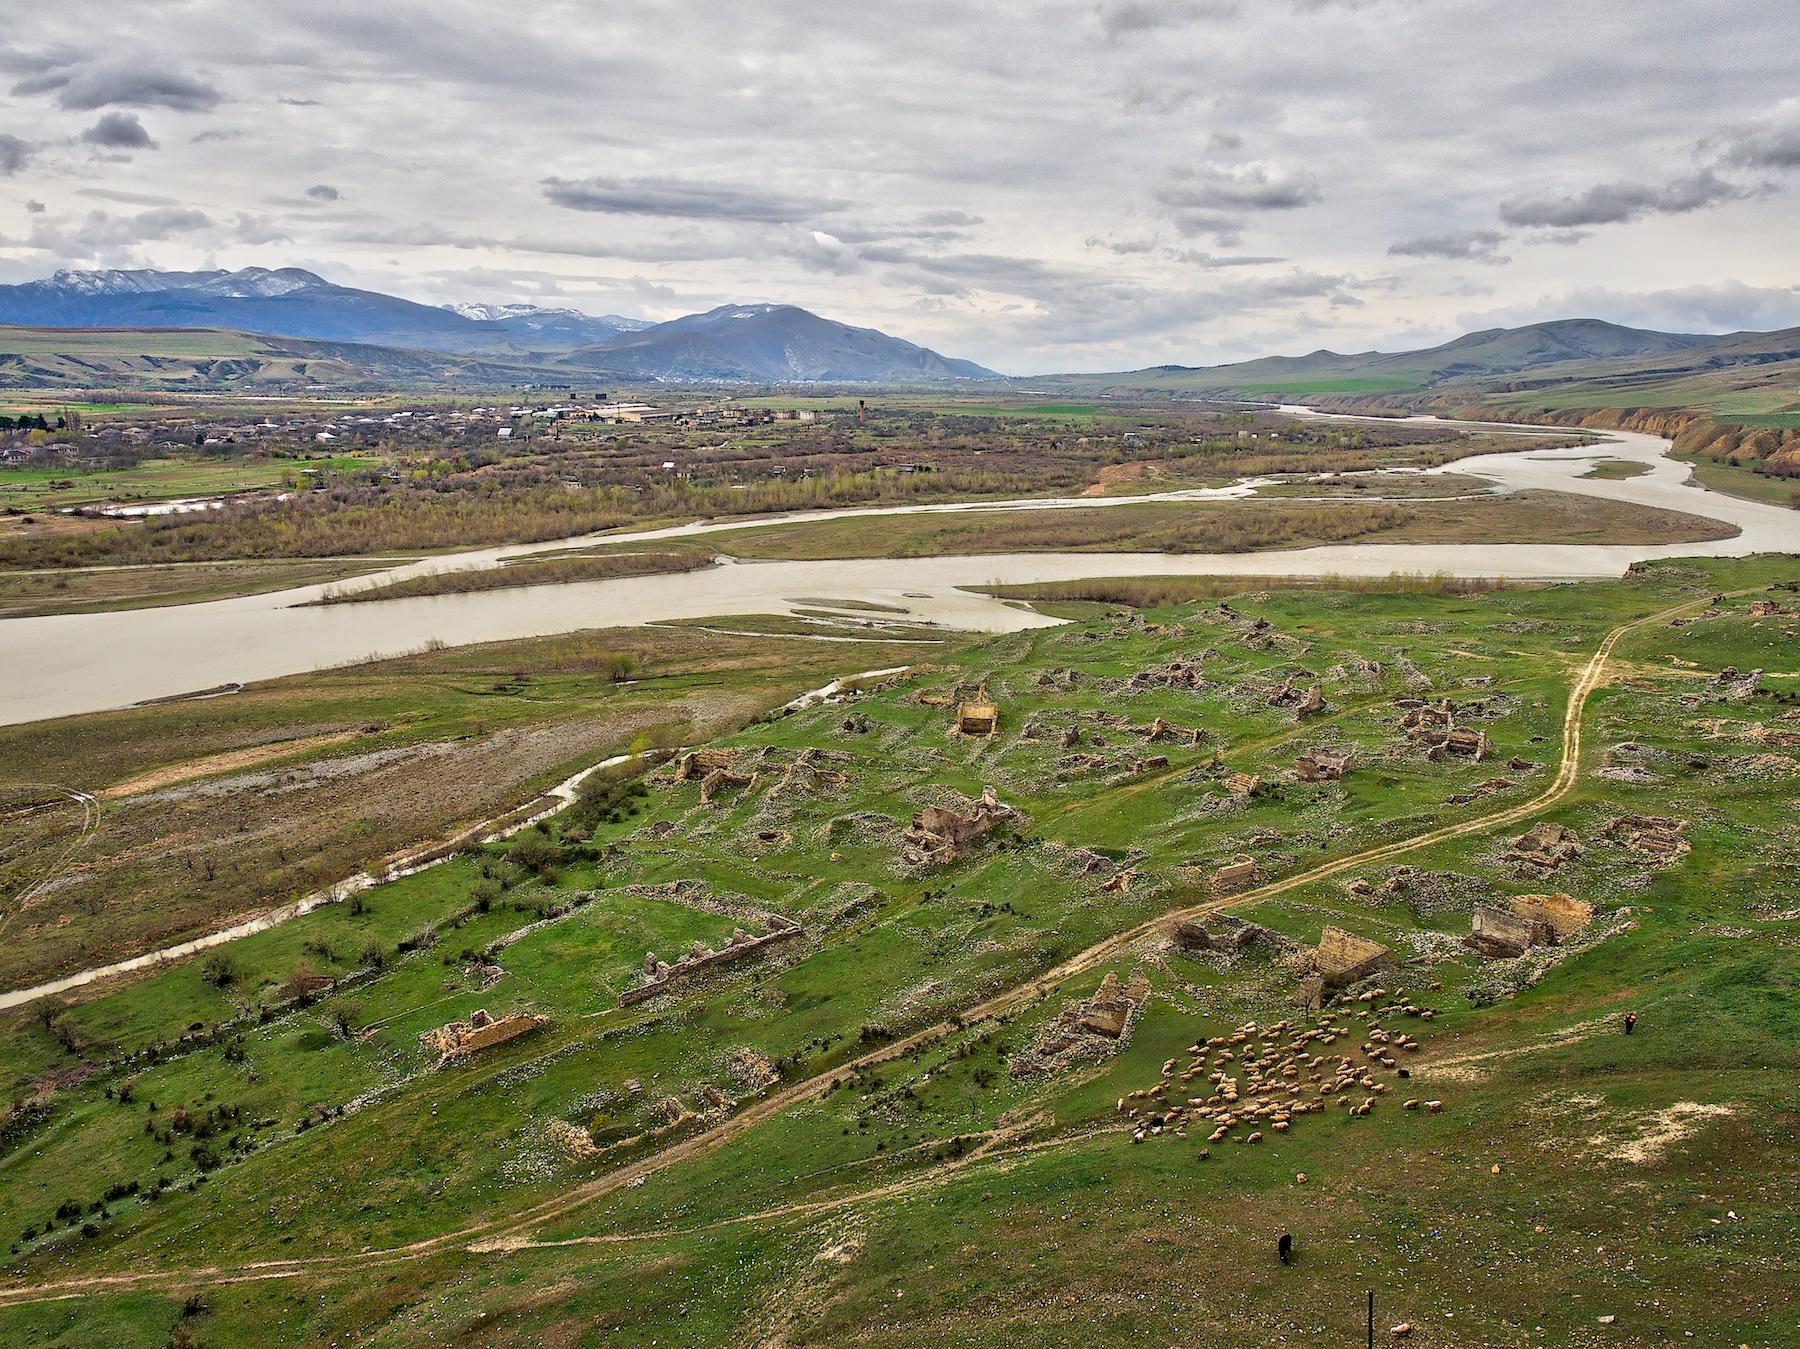 View from Uplistsikhe